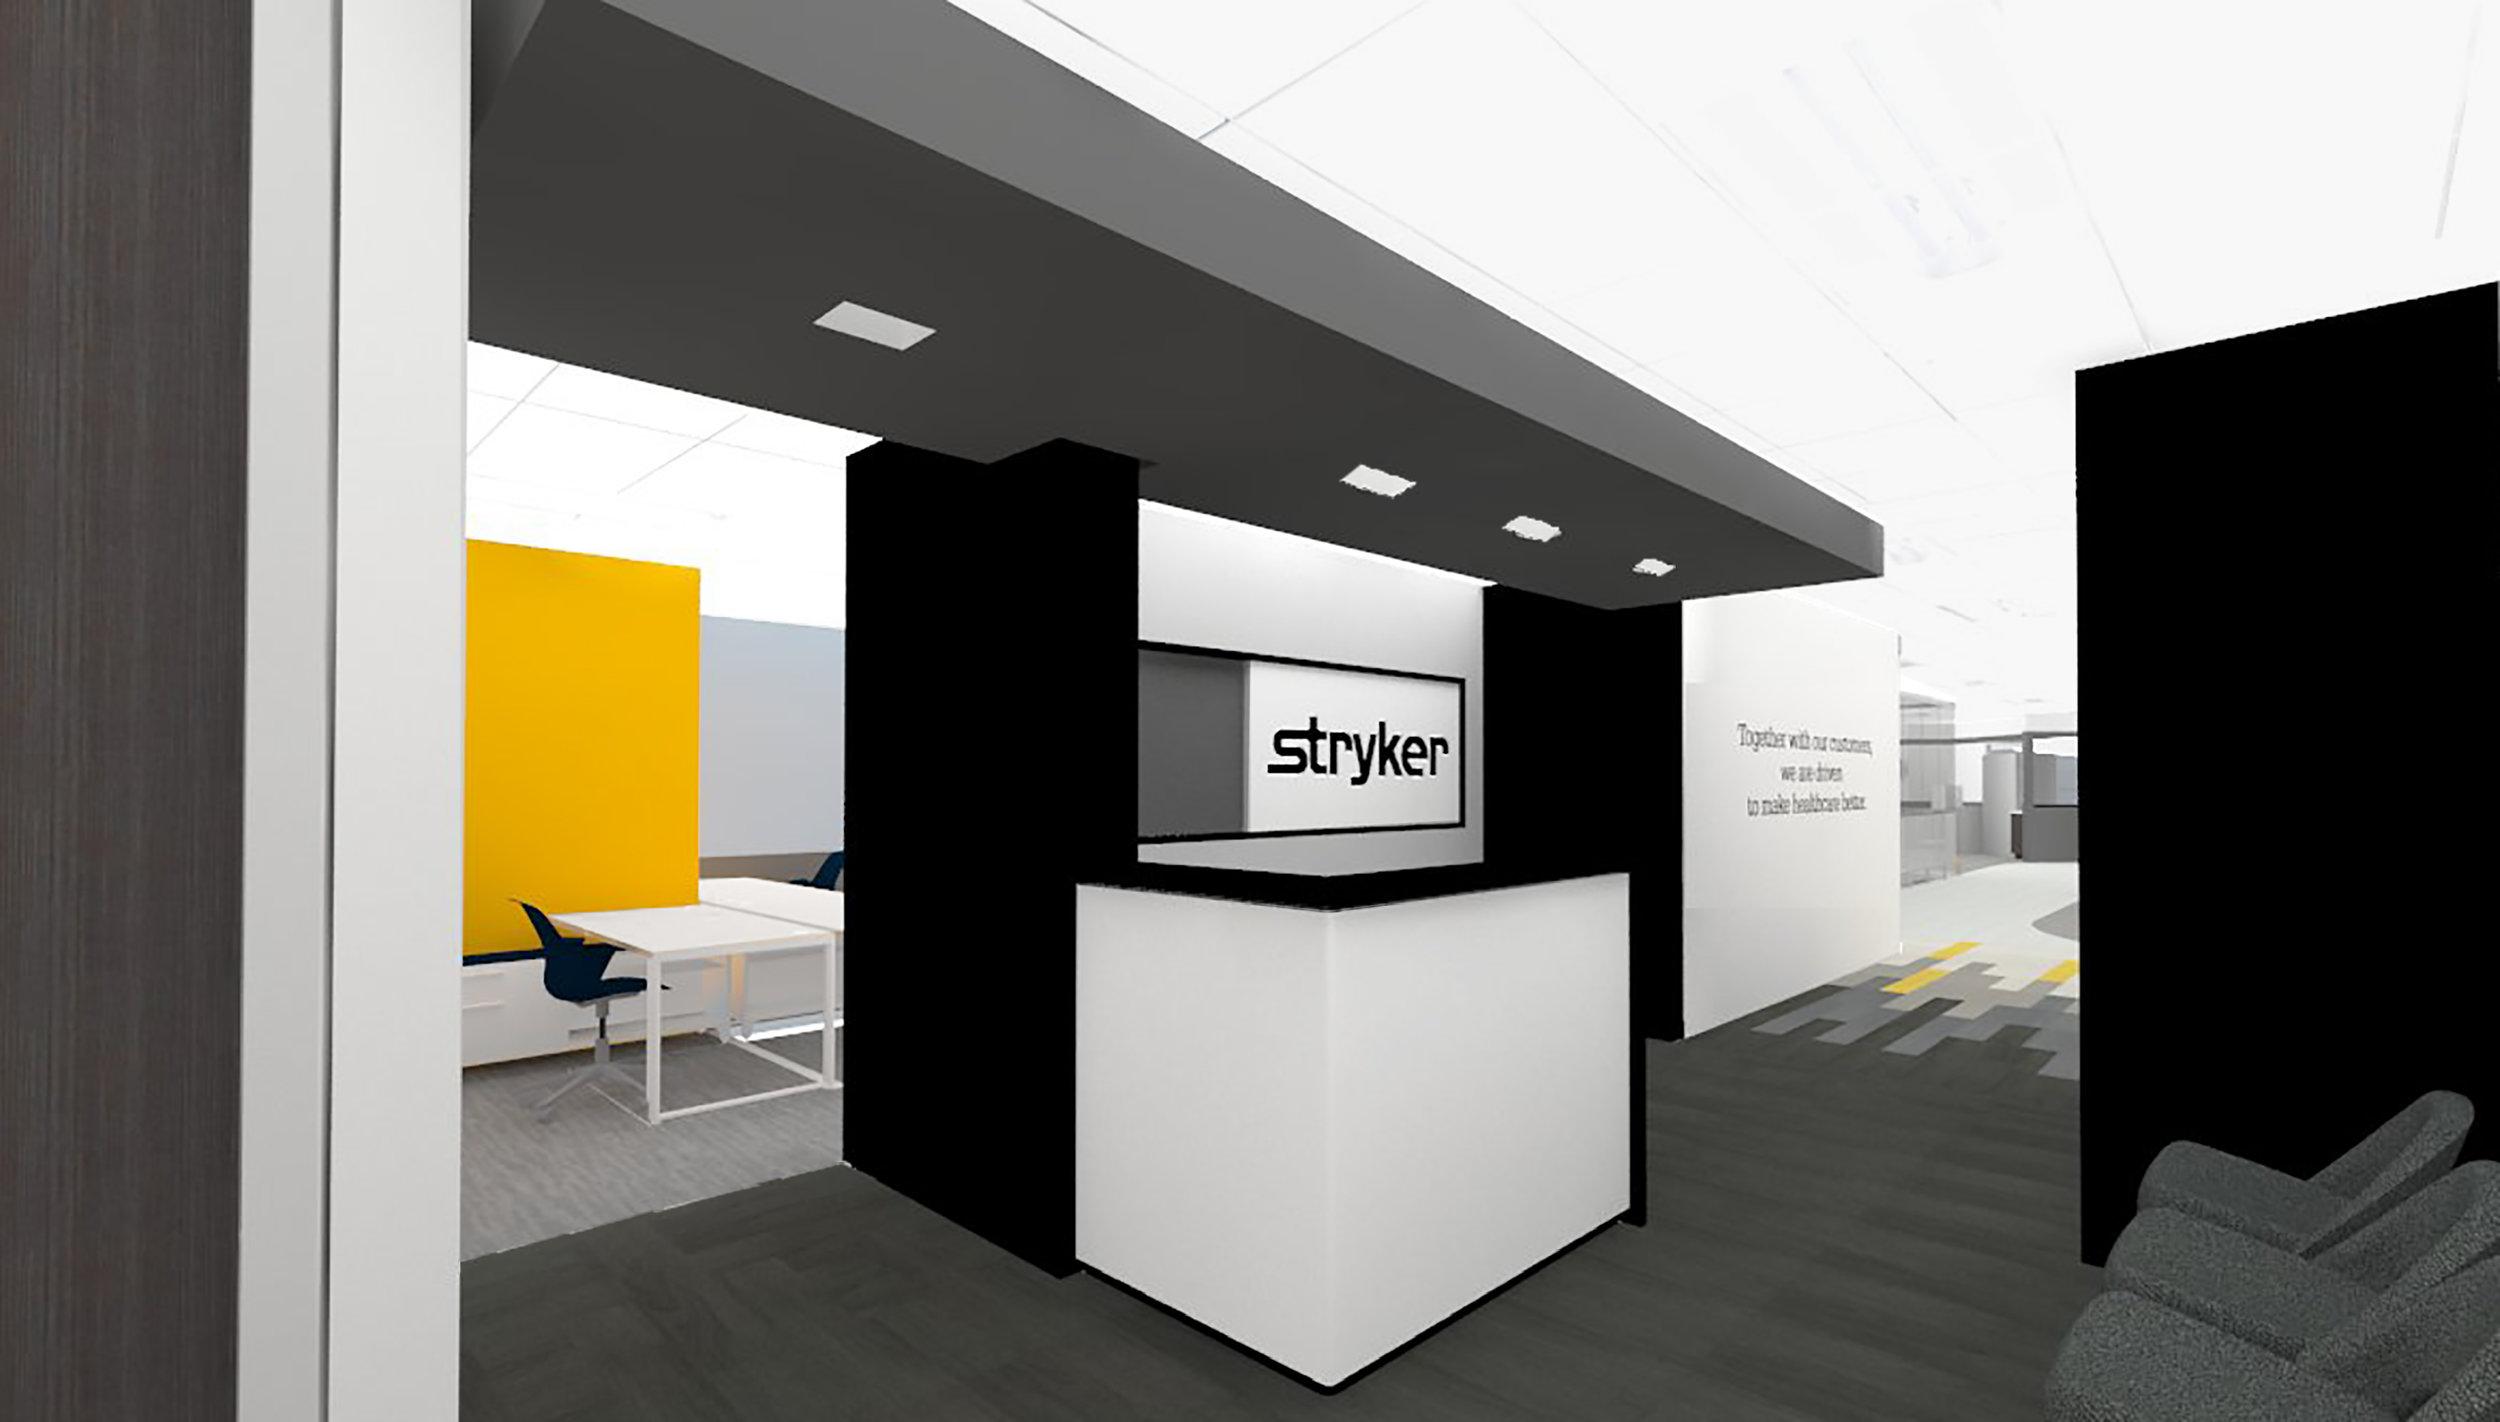 Stryker OnSite Simulation Lab